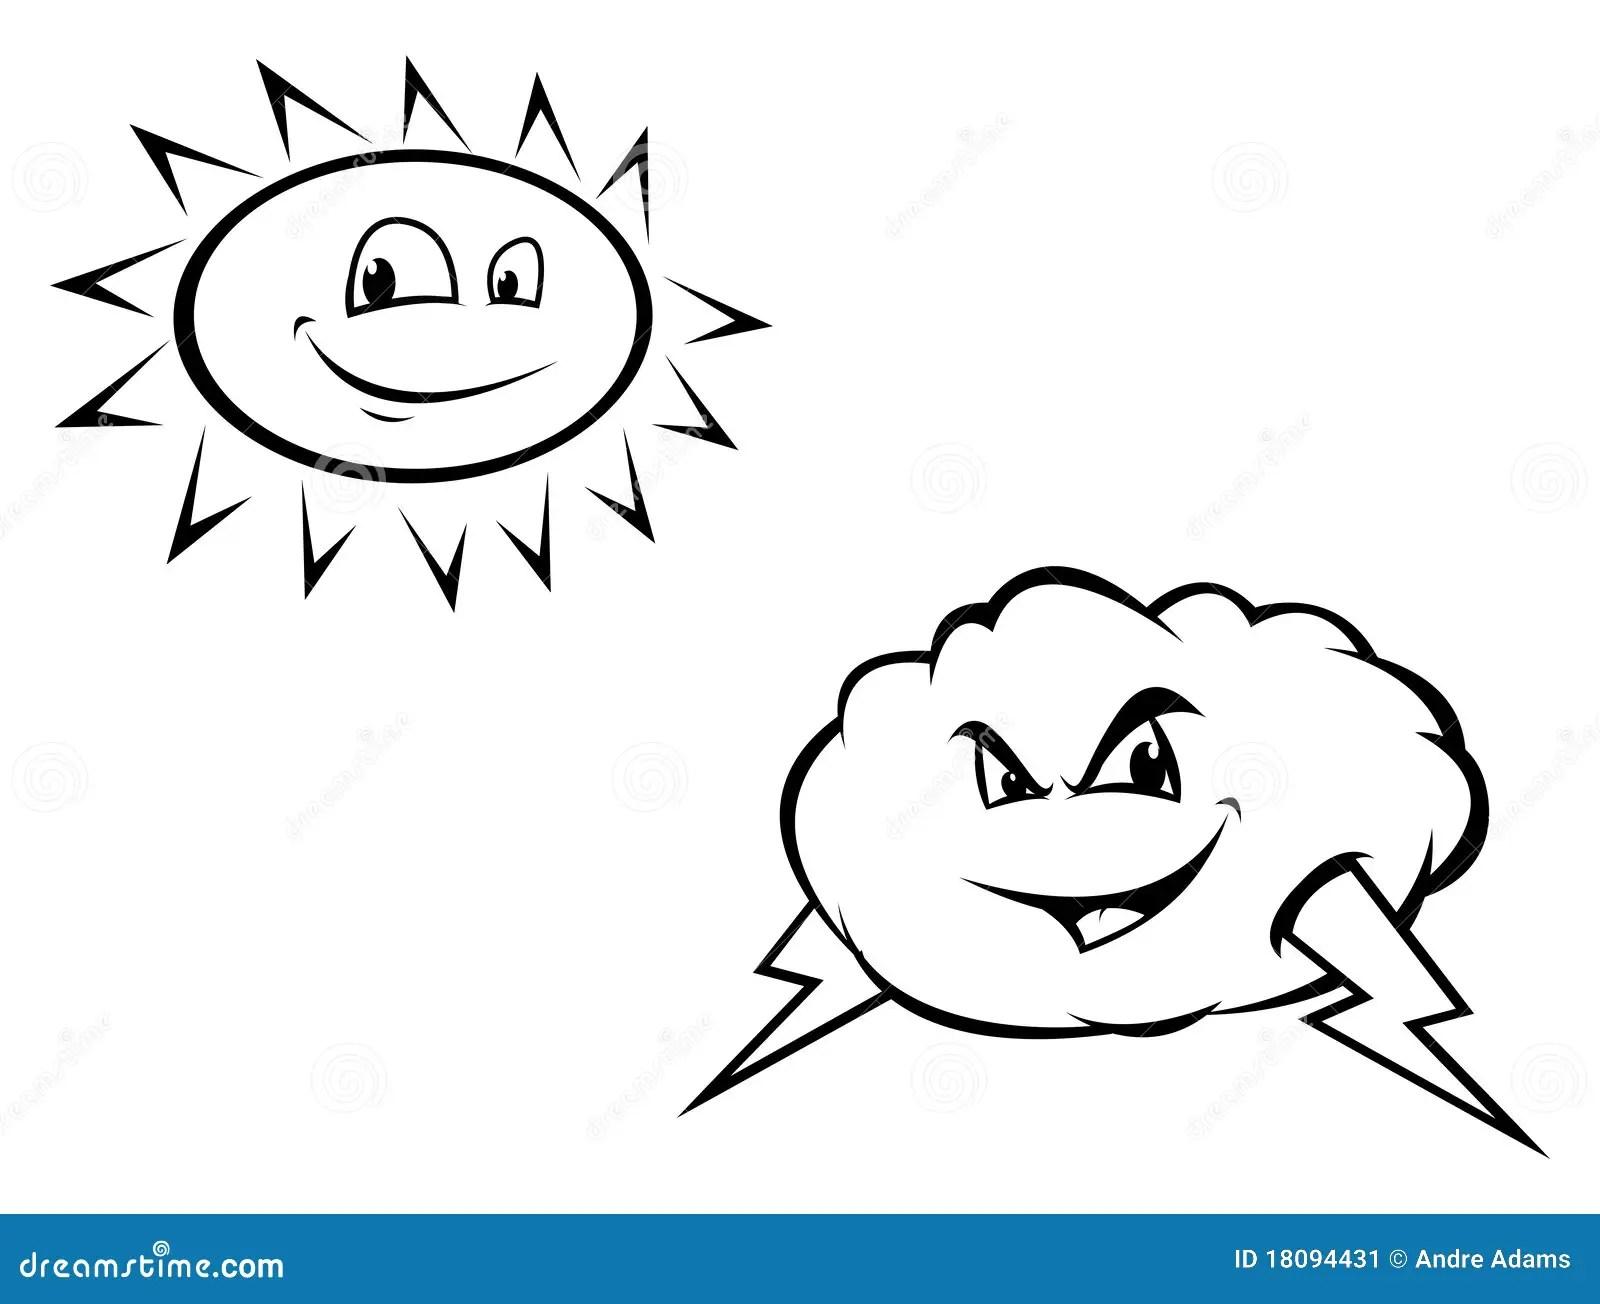 Sun Amp Storm Cloud Outline Stock Image